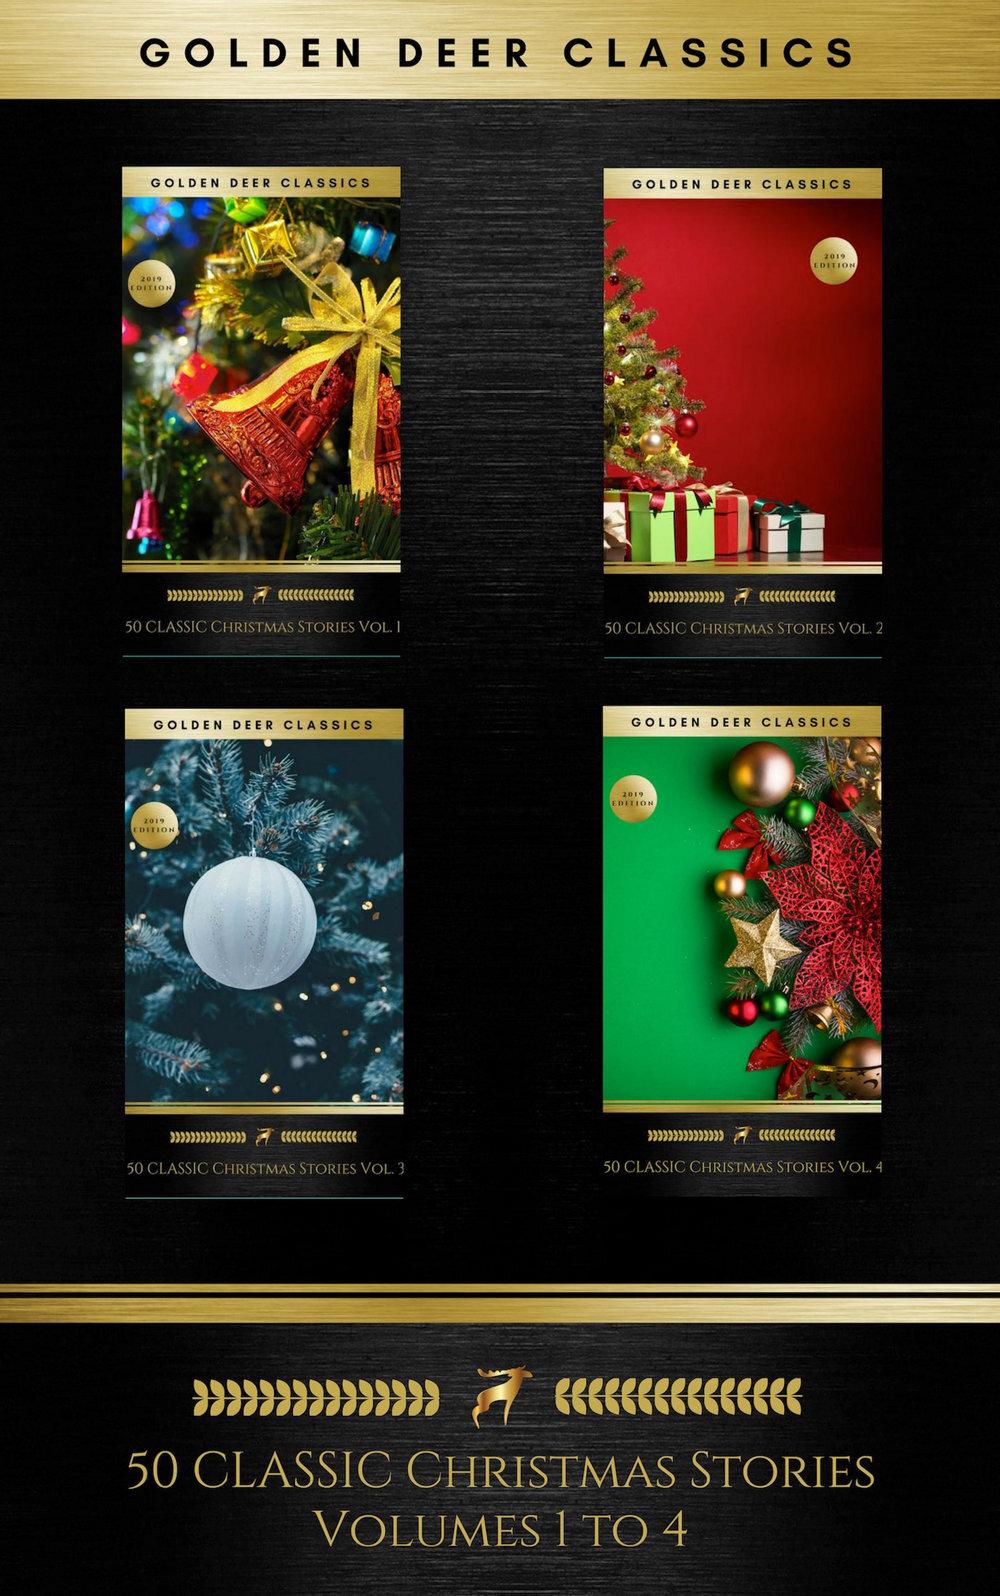 50 classic christmas stories maxipack 100 authors 200 novels novellas stories poems carols golden deer classics